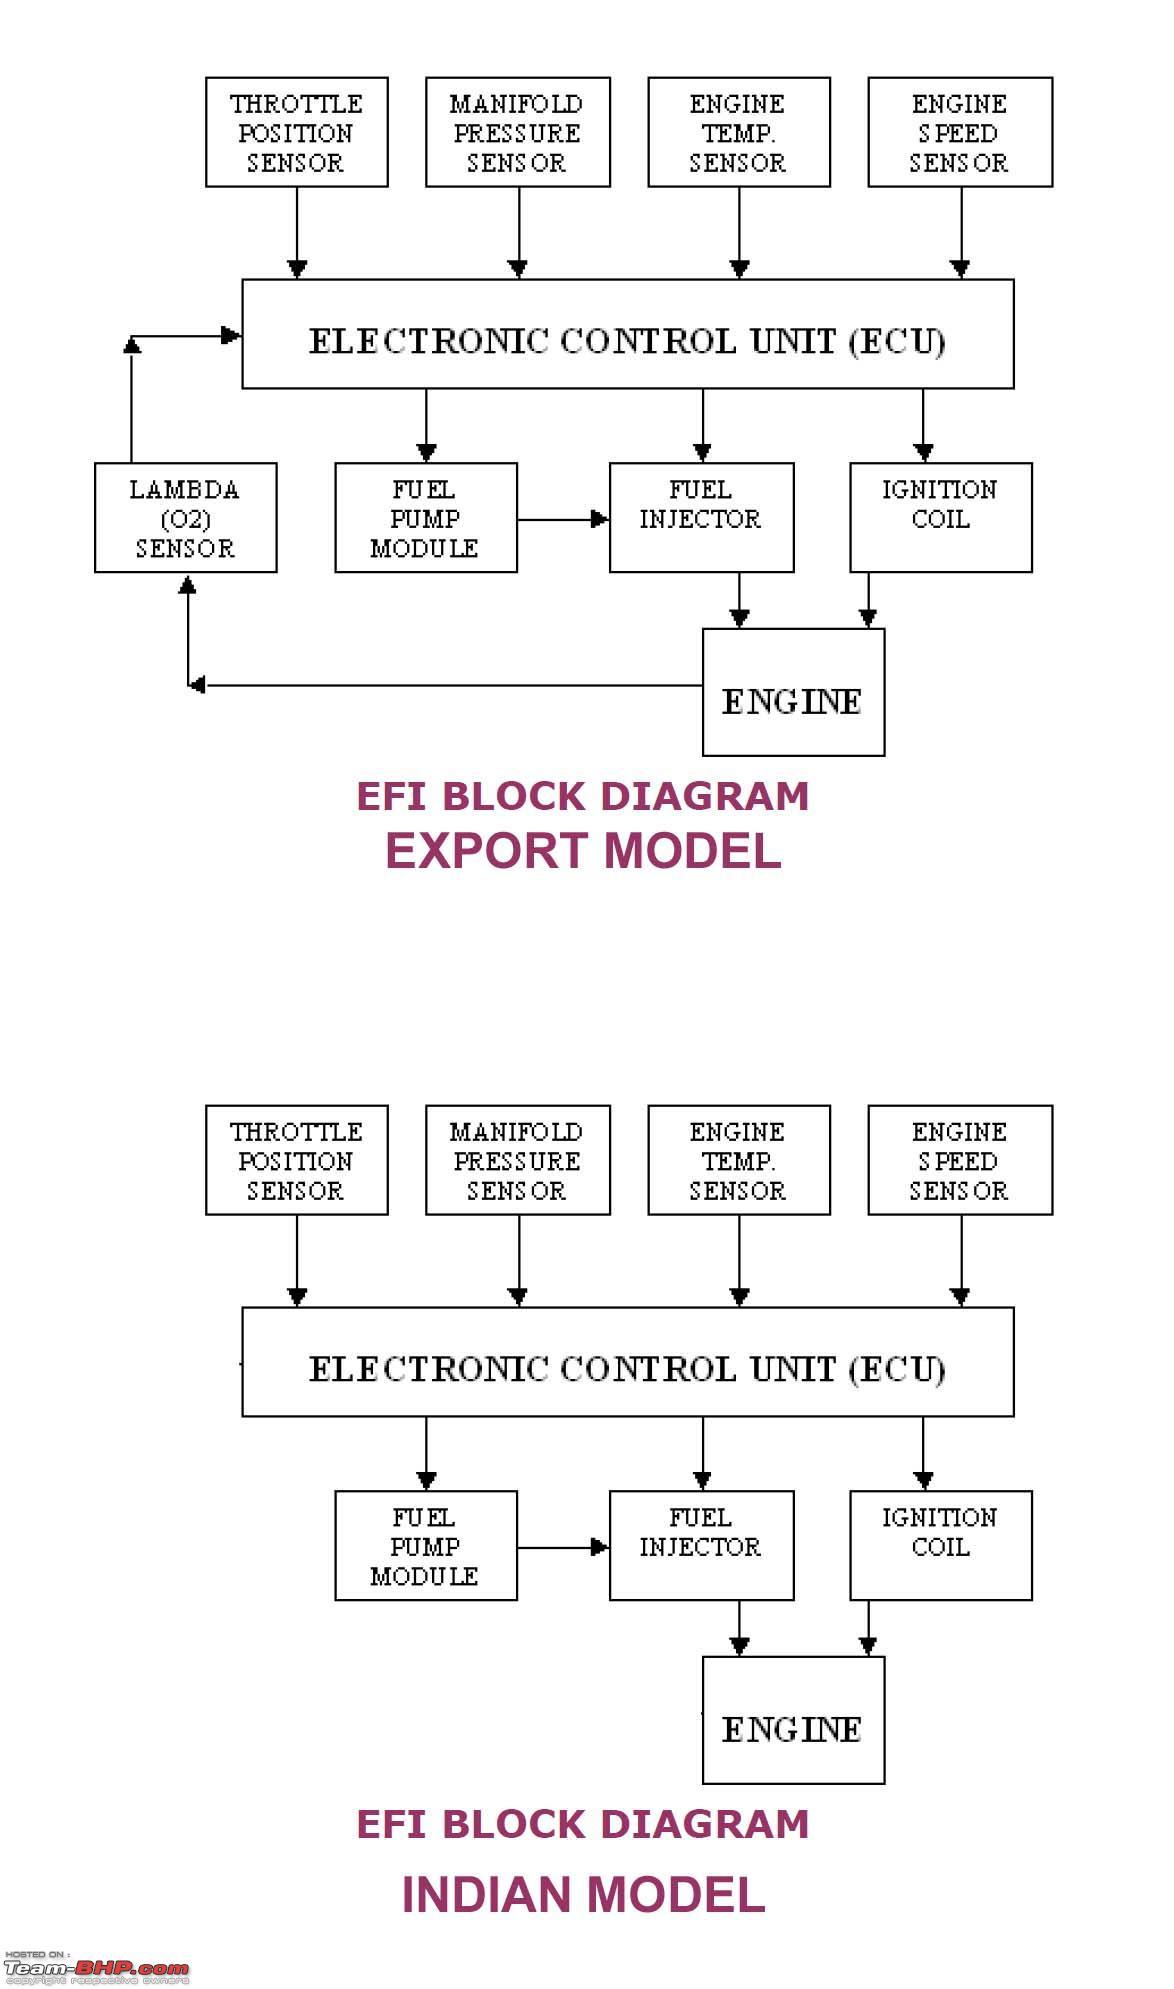 2003 nps50 nps 50 ruckus honda original owners manual ebook diagram as well  2009 honda crf230l